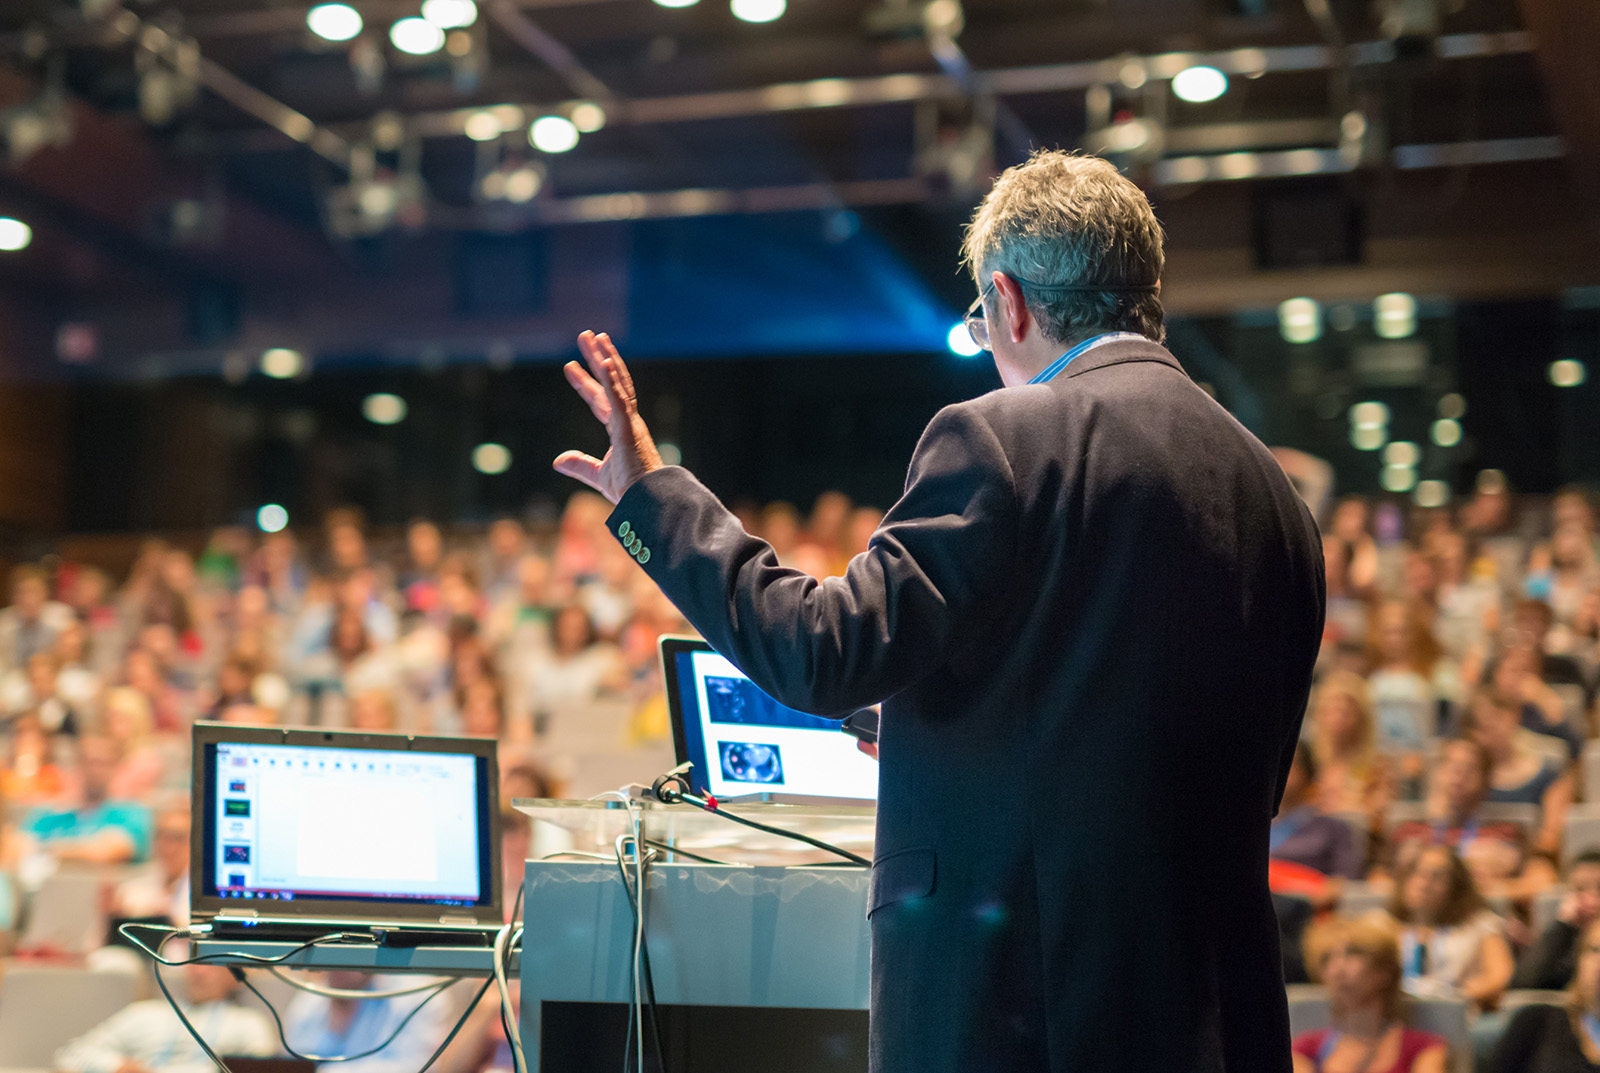 CSH Conference Speaker mit Laptops vor Publikum